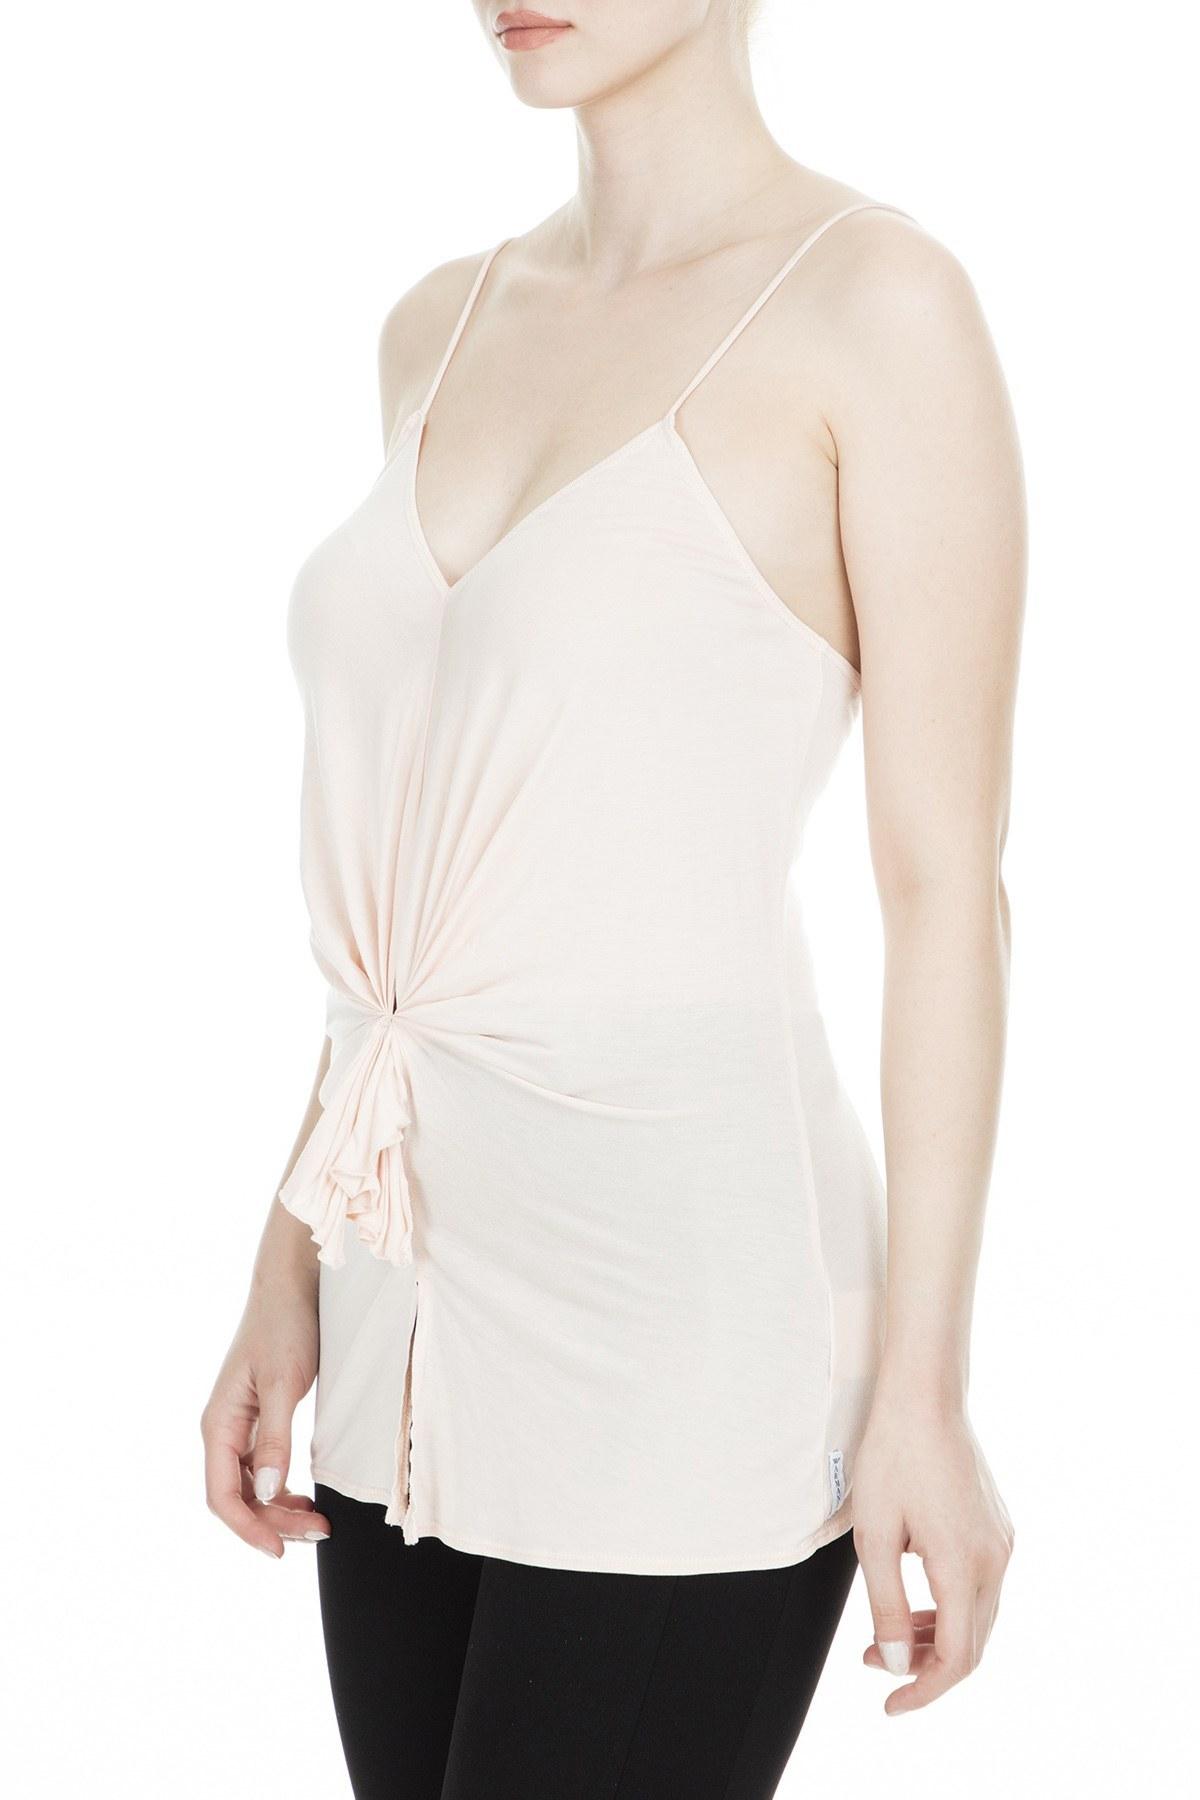 Armani Kadın Bluz 5K5 087NY PEMBE